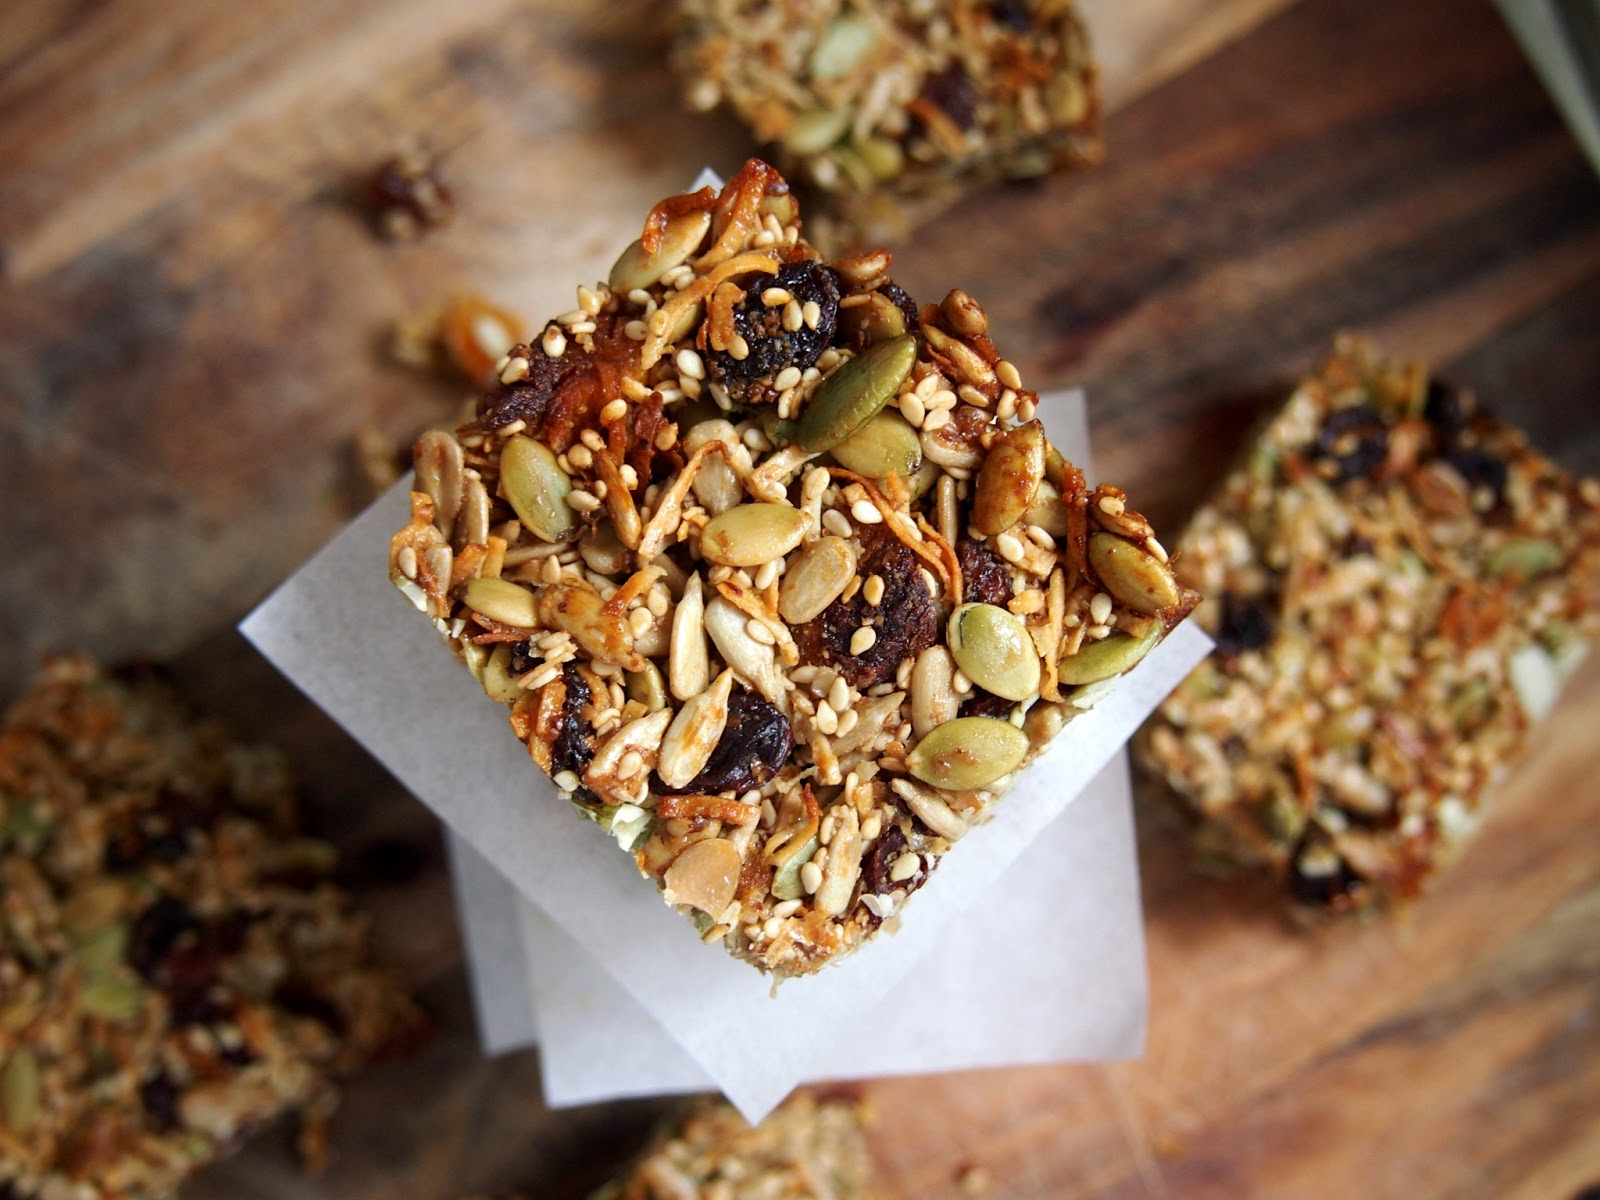 petite kitchen: the tastiest granola snack bars